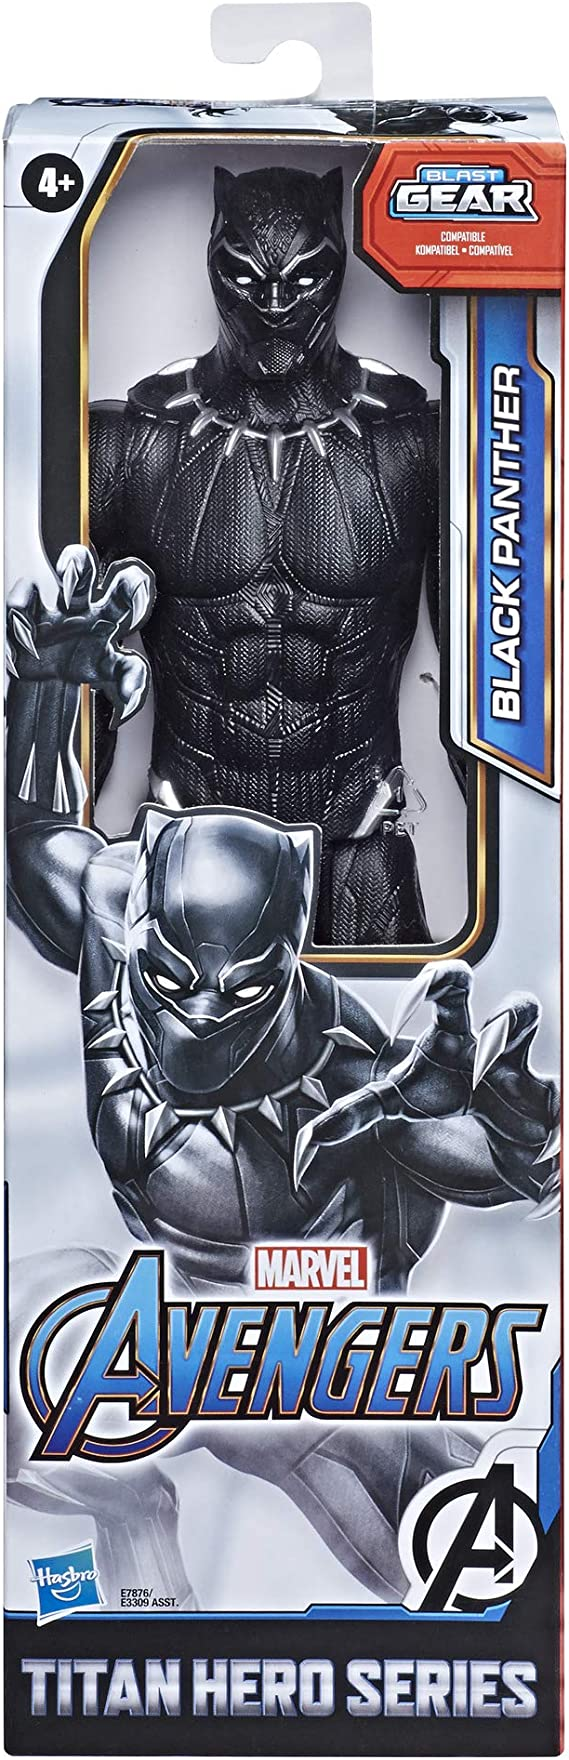 Avengers Marvel Titan Hero Série BLACK PANTHER Action Figure